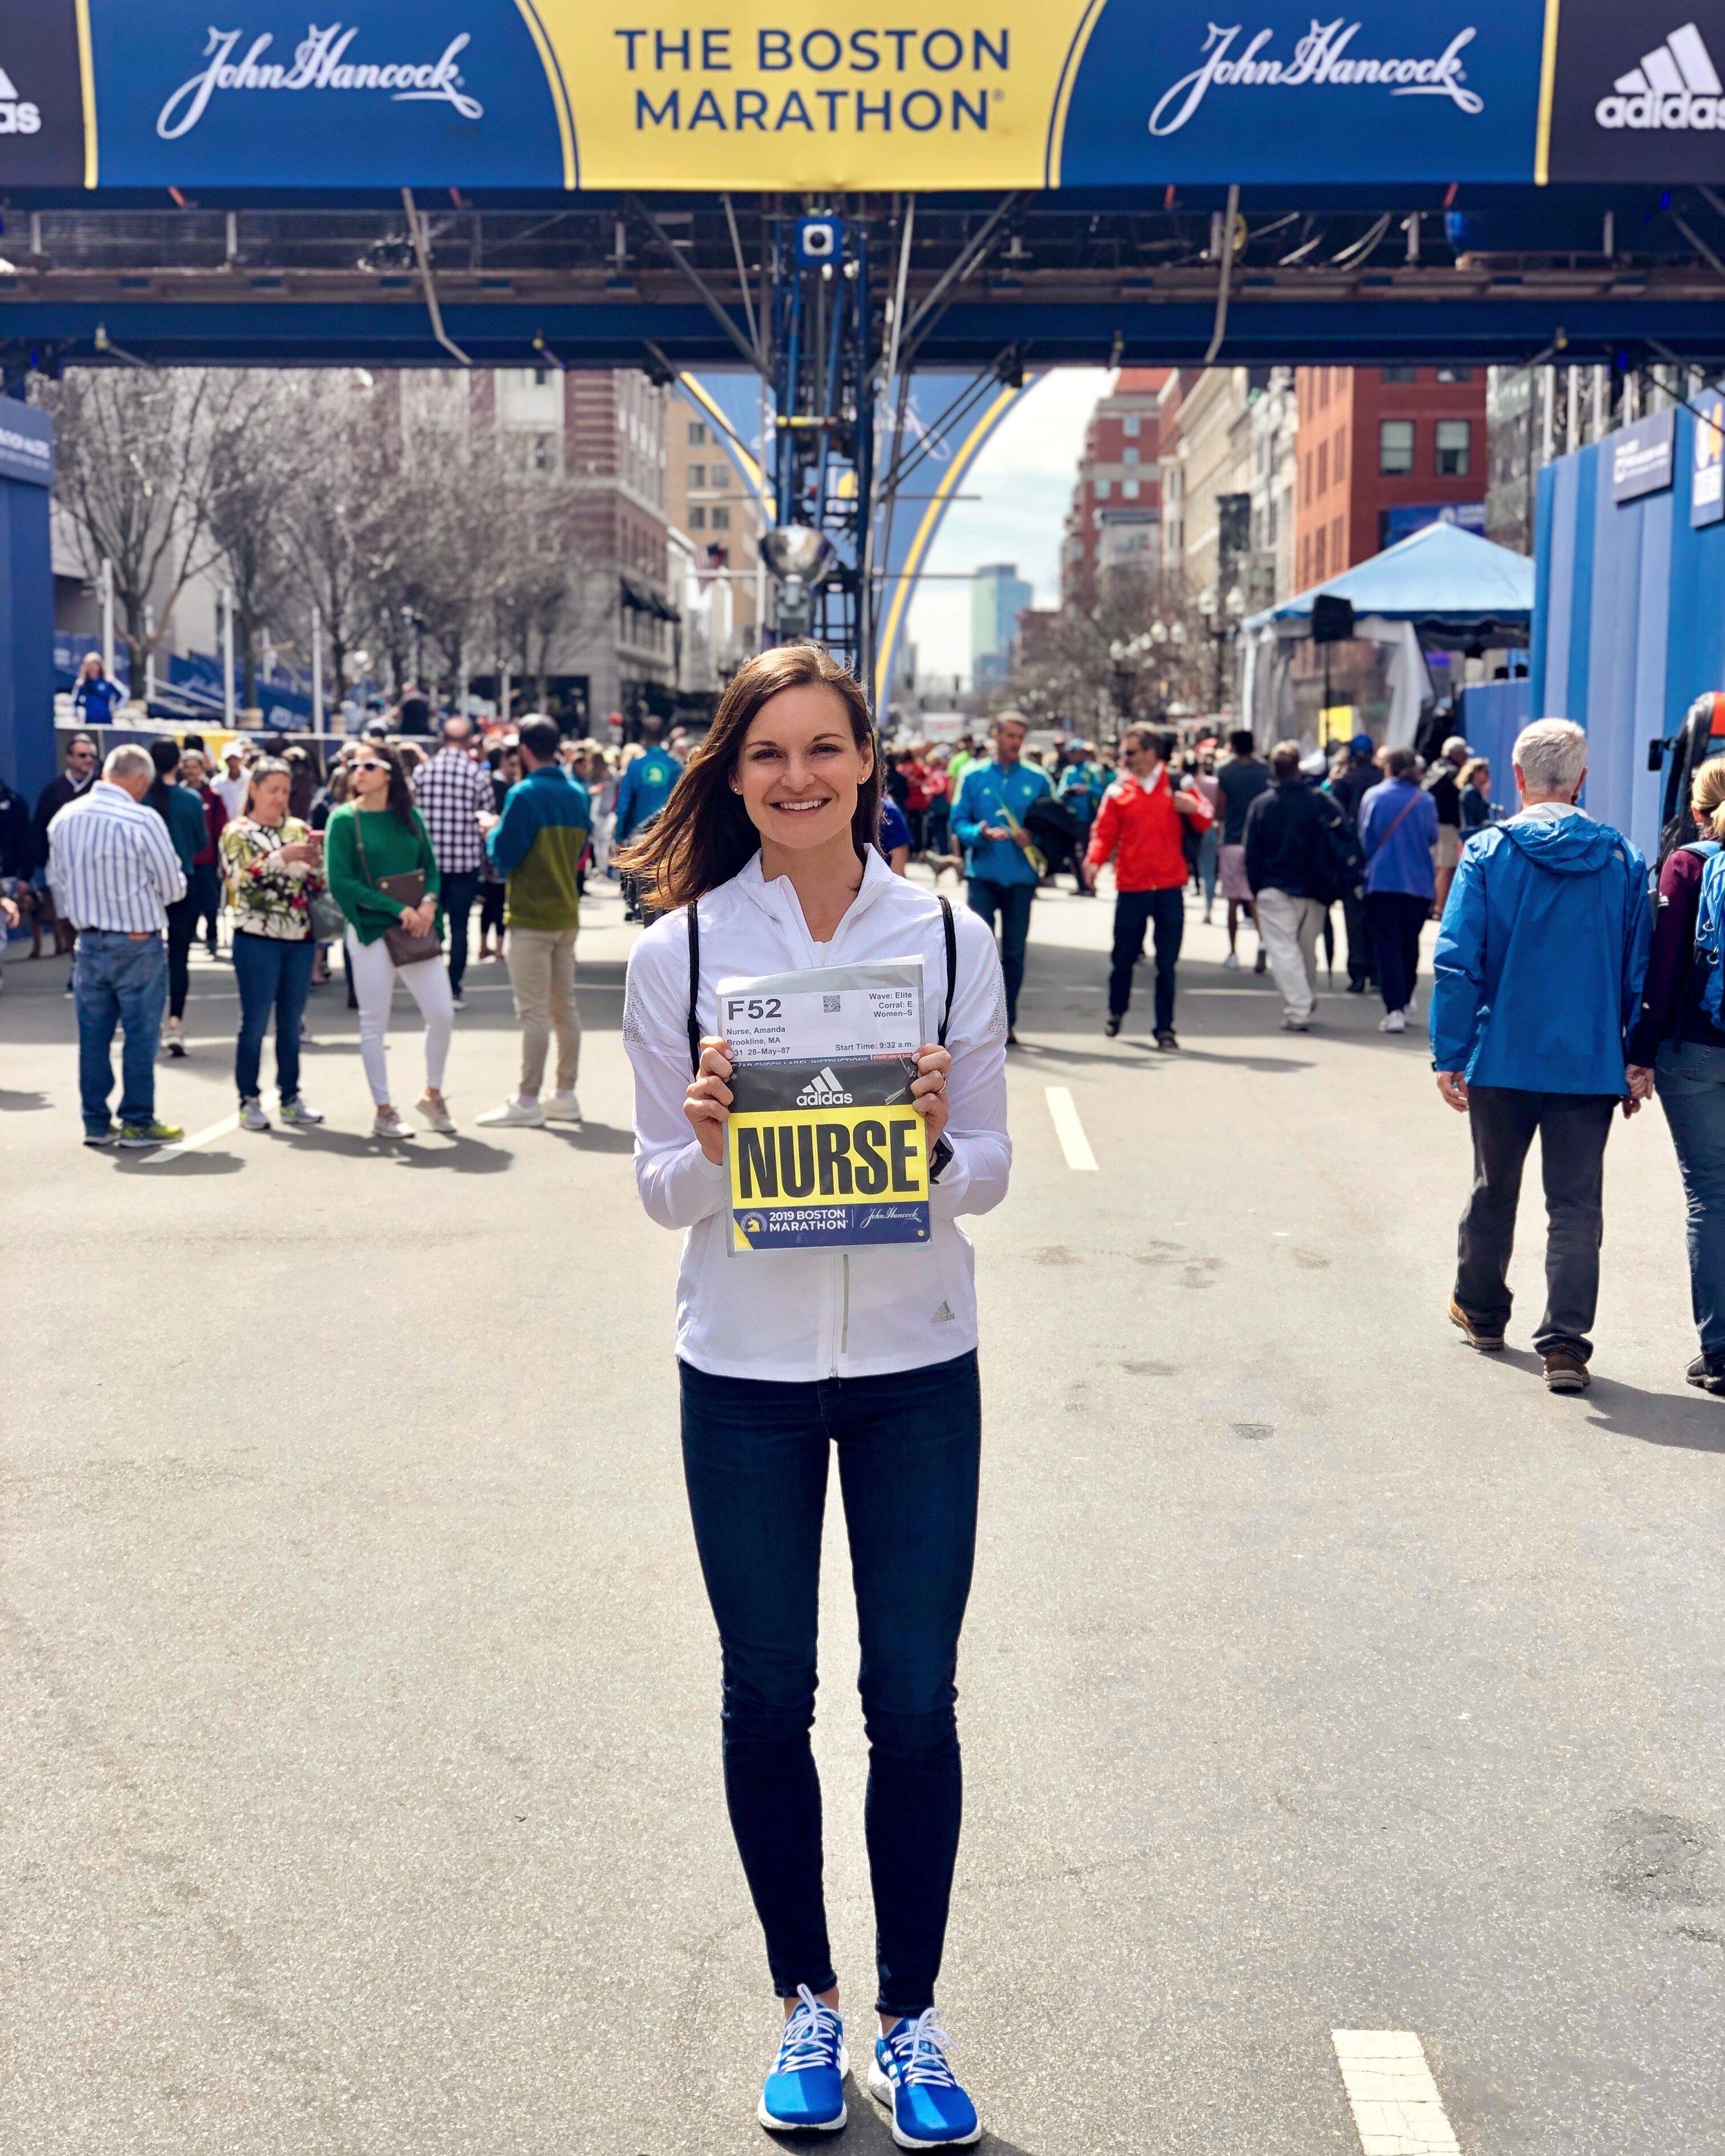 My 20th marathon, Boston 2019 (2:42:30).